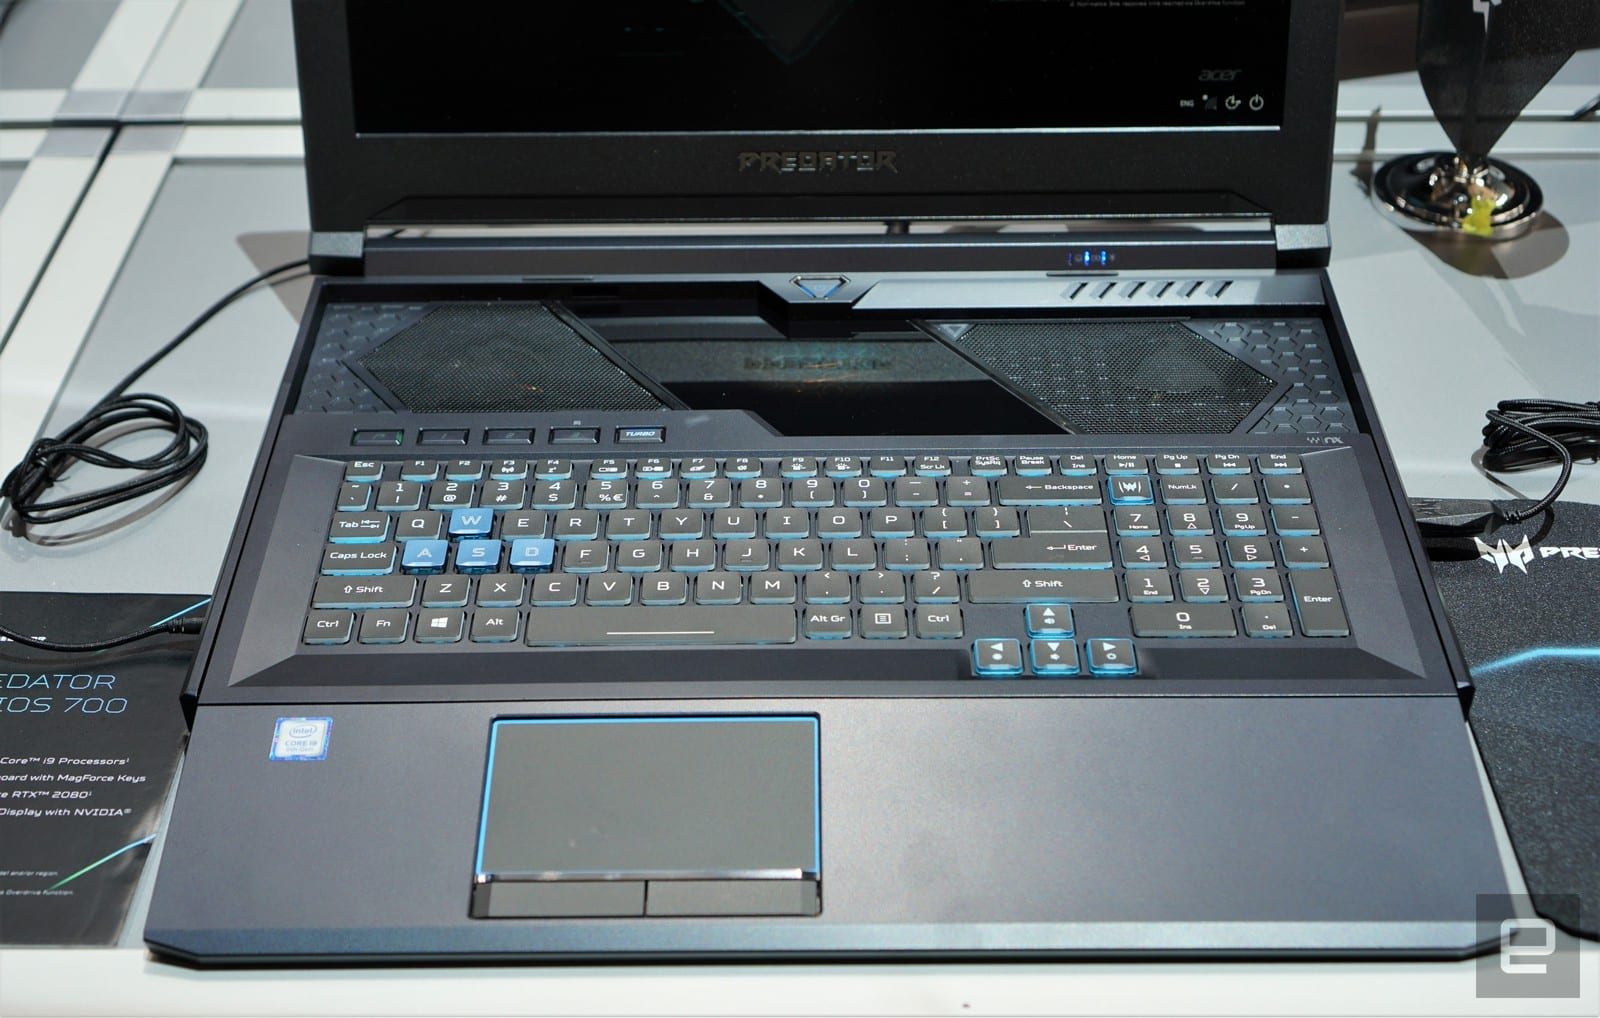 Predator helios 300 touchpad driver | Predator Helios 300